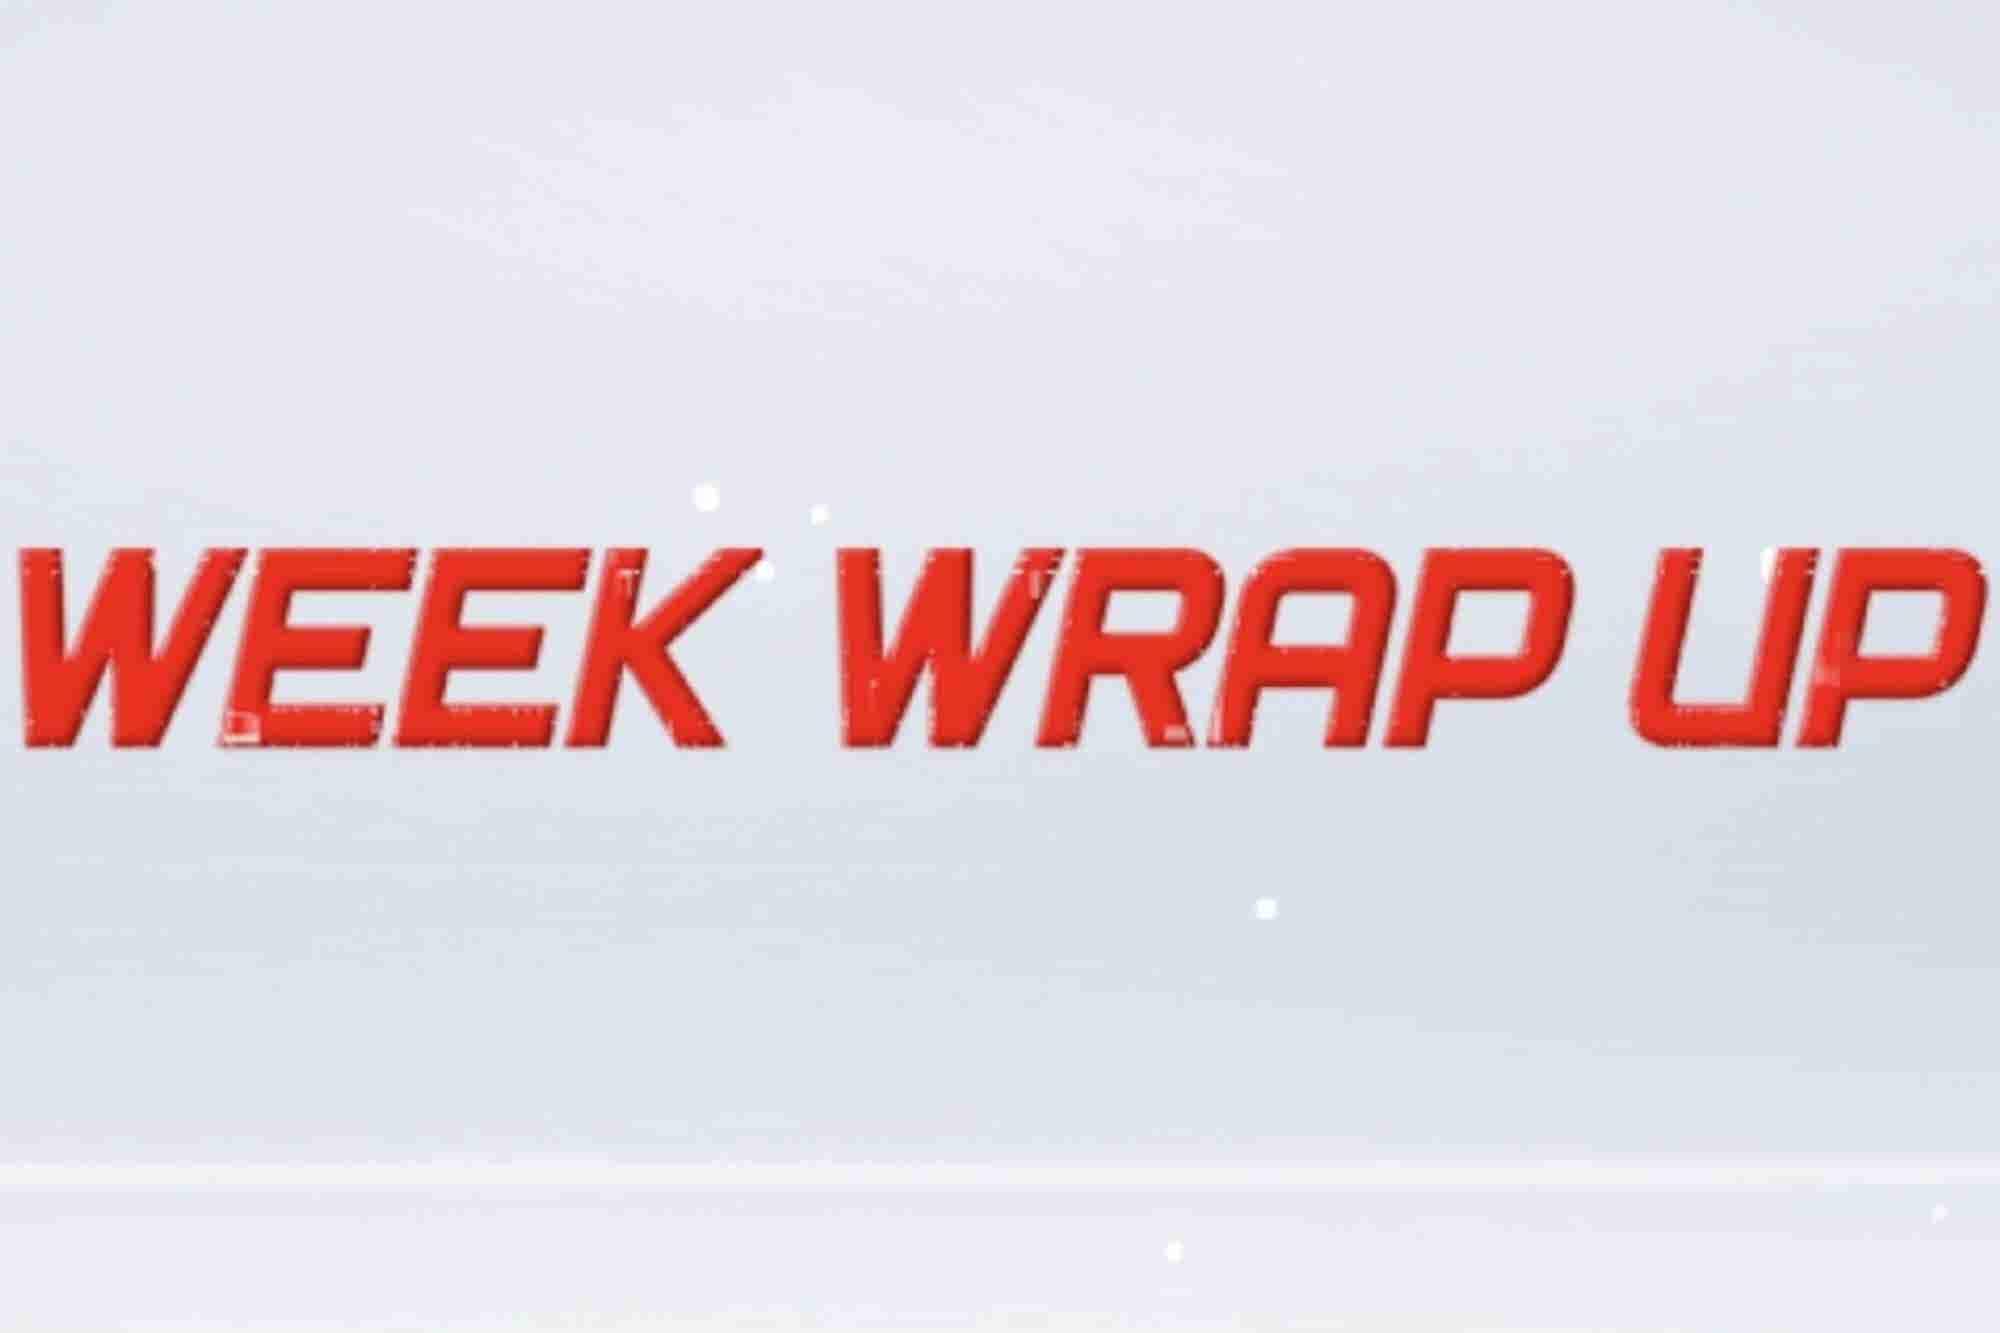 Week Wrap Up: Flipkart Founder Binny Bansal Steps Down As Company's Gr...